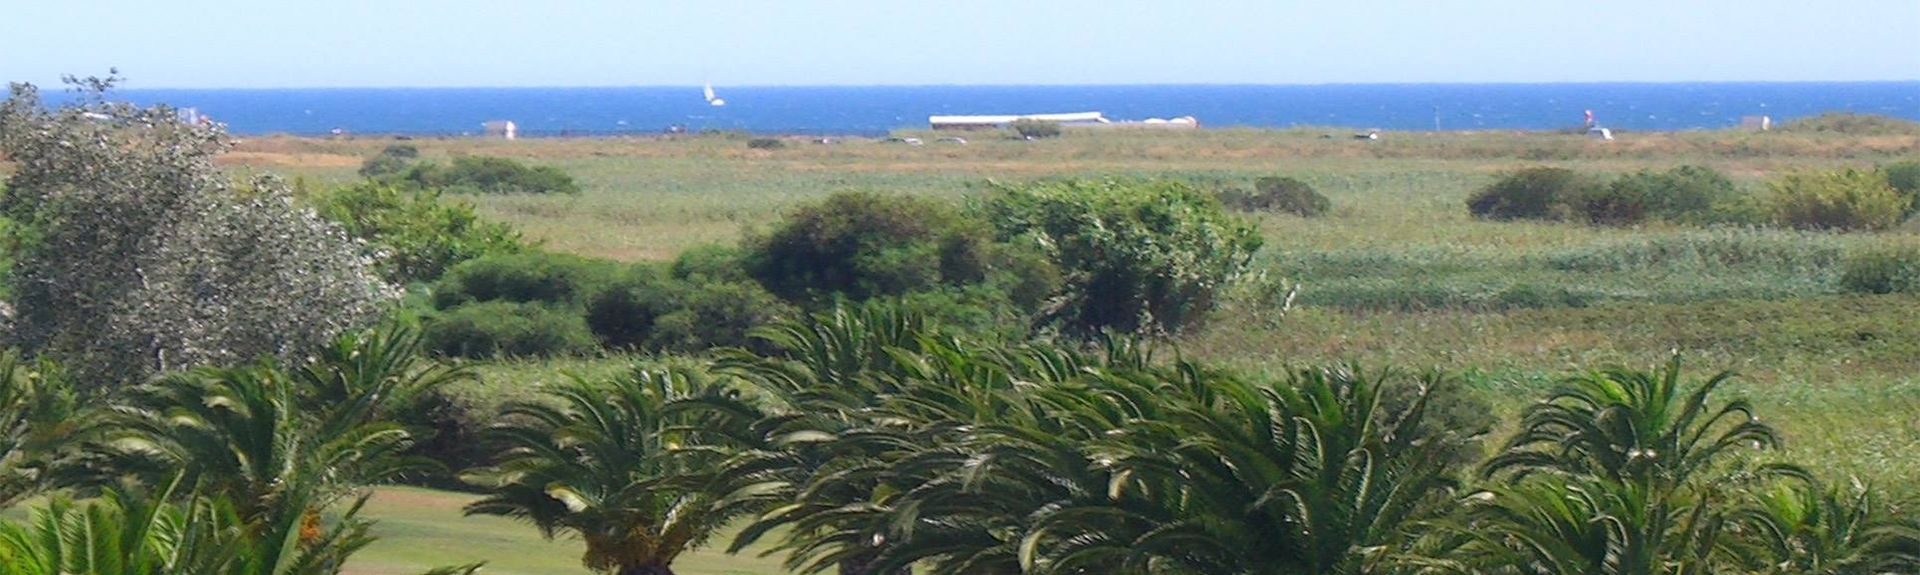 Dom Pedro Lagunan golfkenttä (Quarteira, Faron piiri, Portugali)